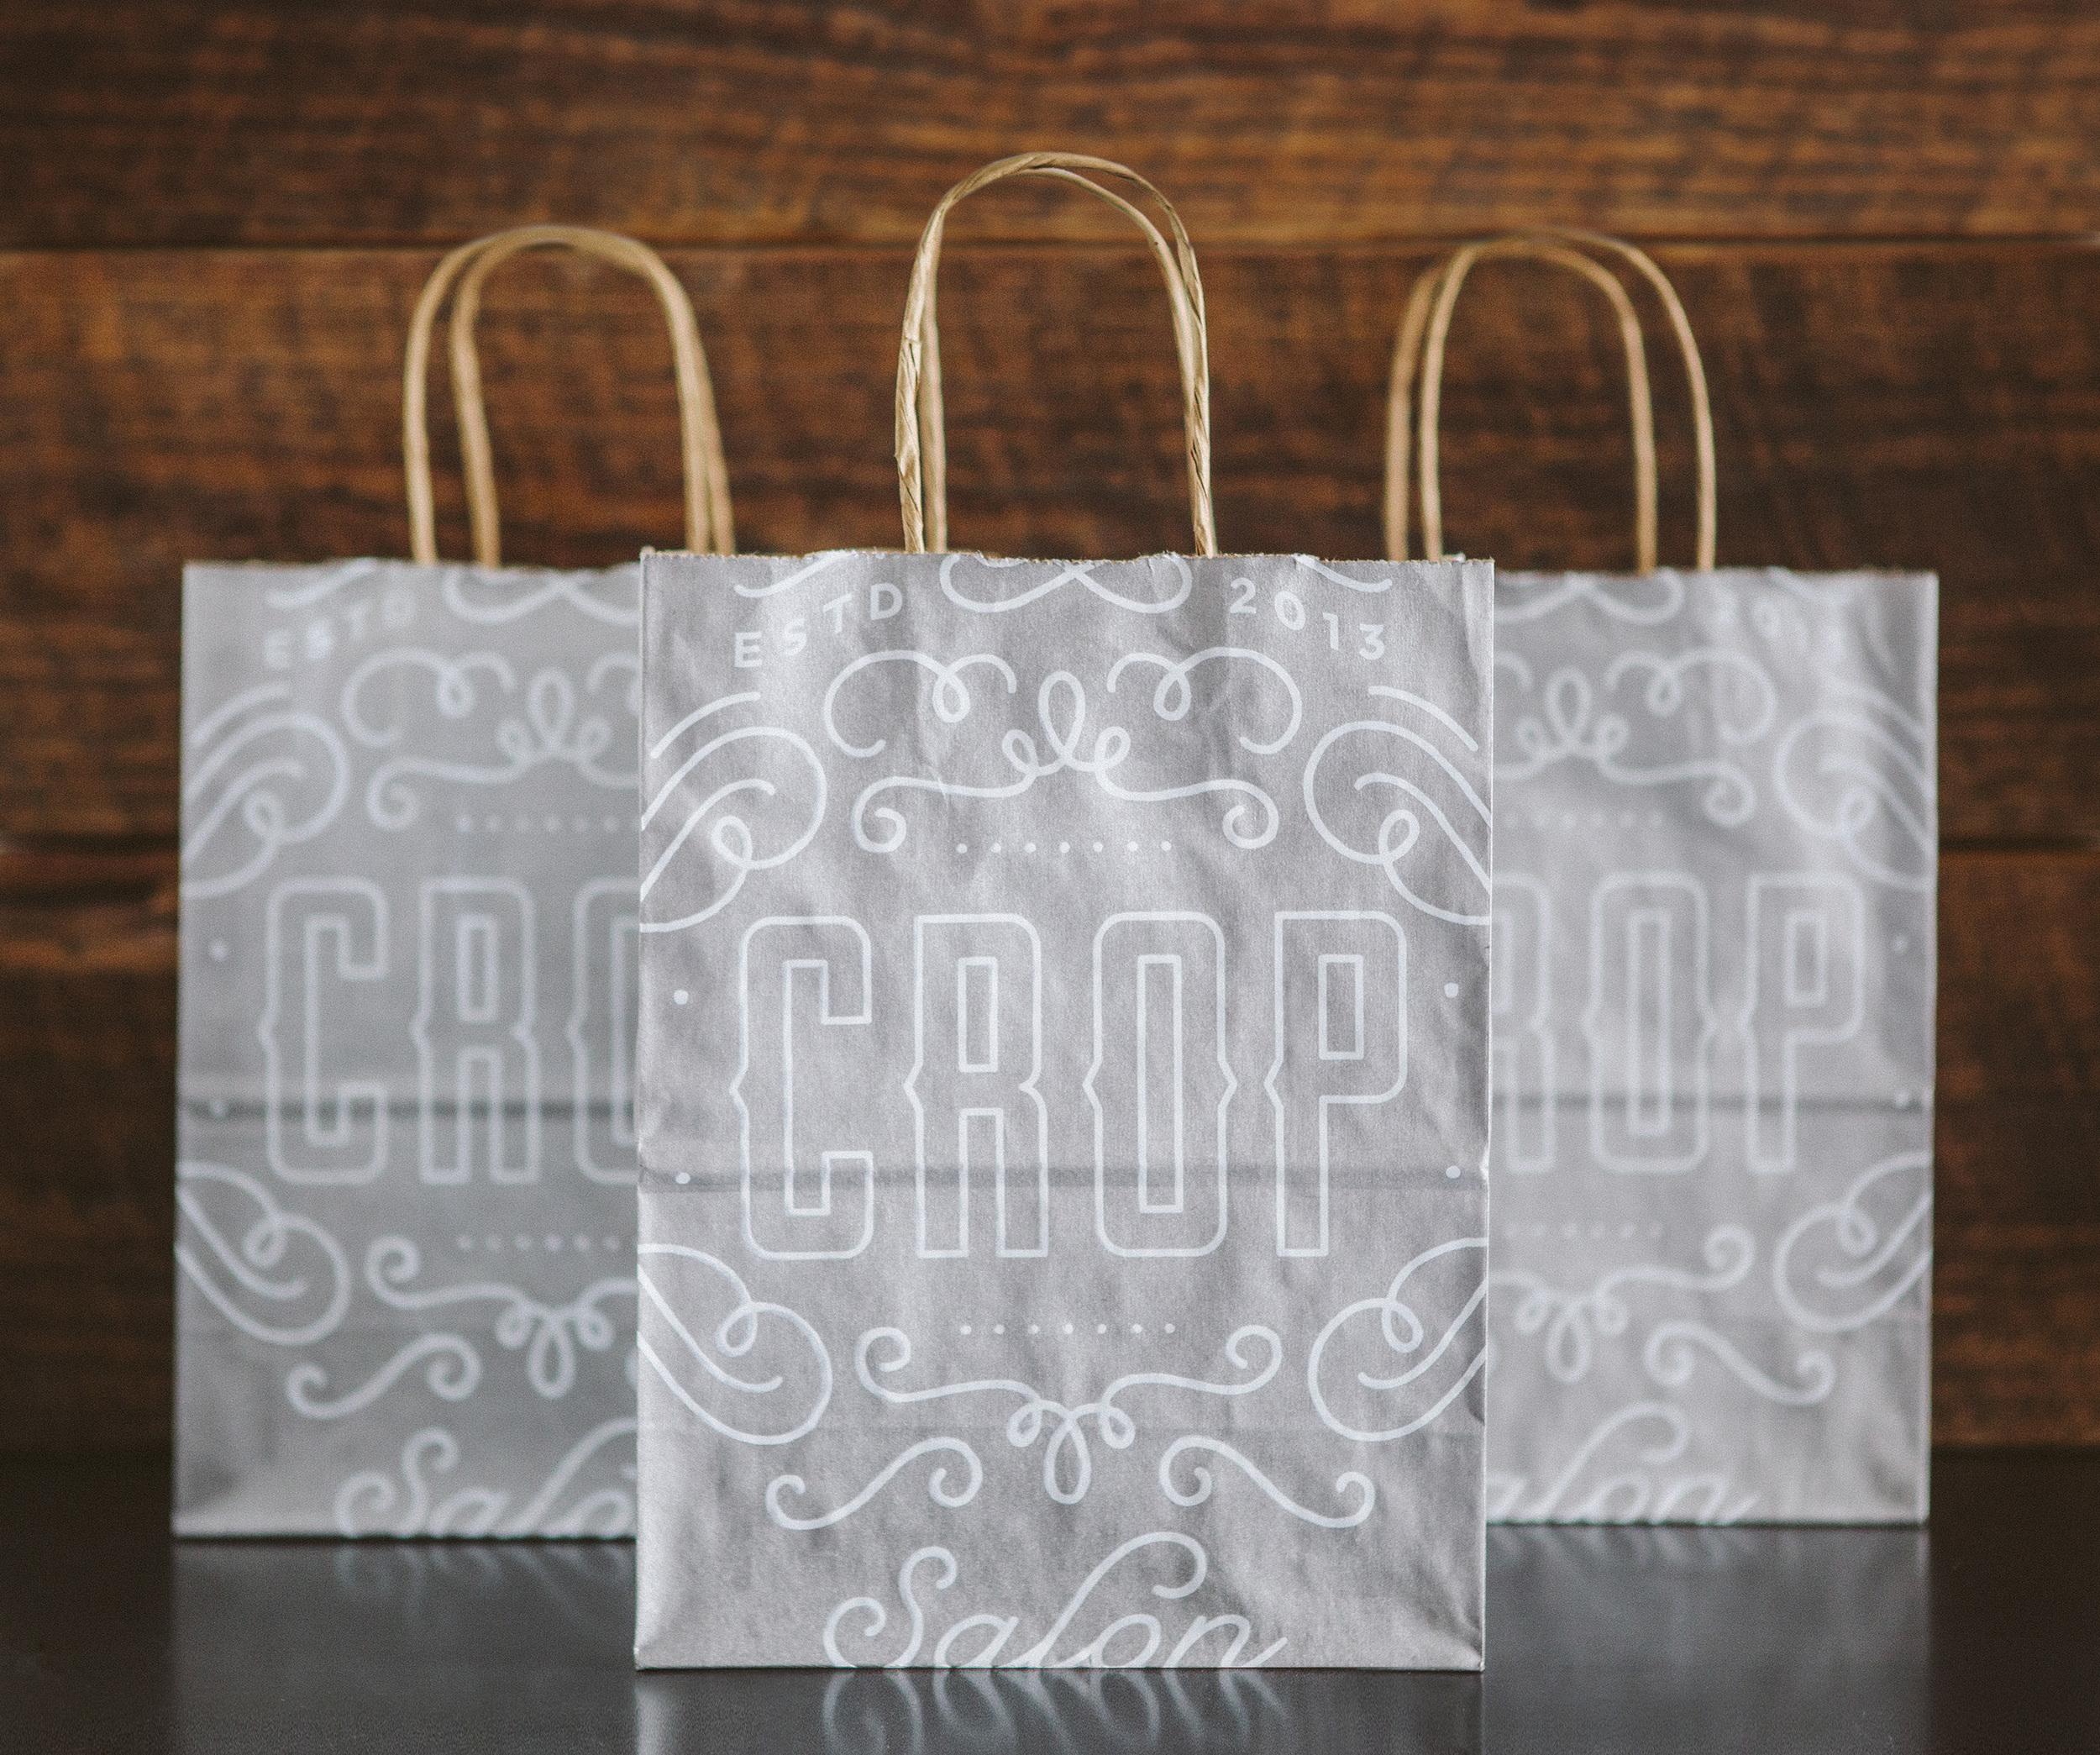 Device_CropBranding_Bag_01.jpg